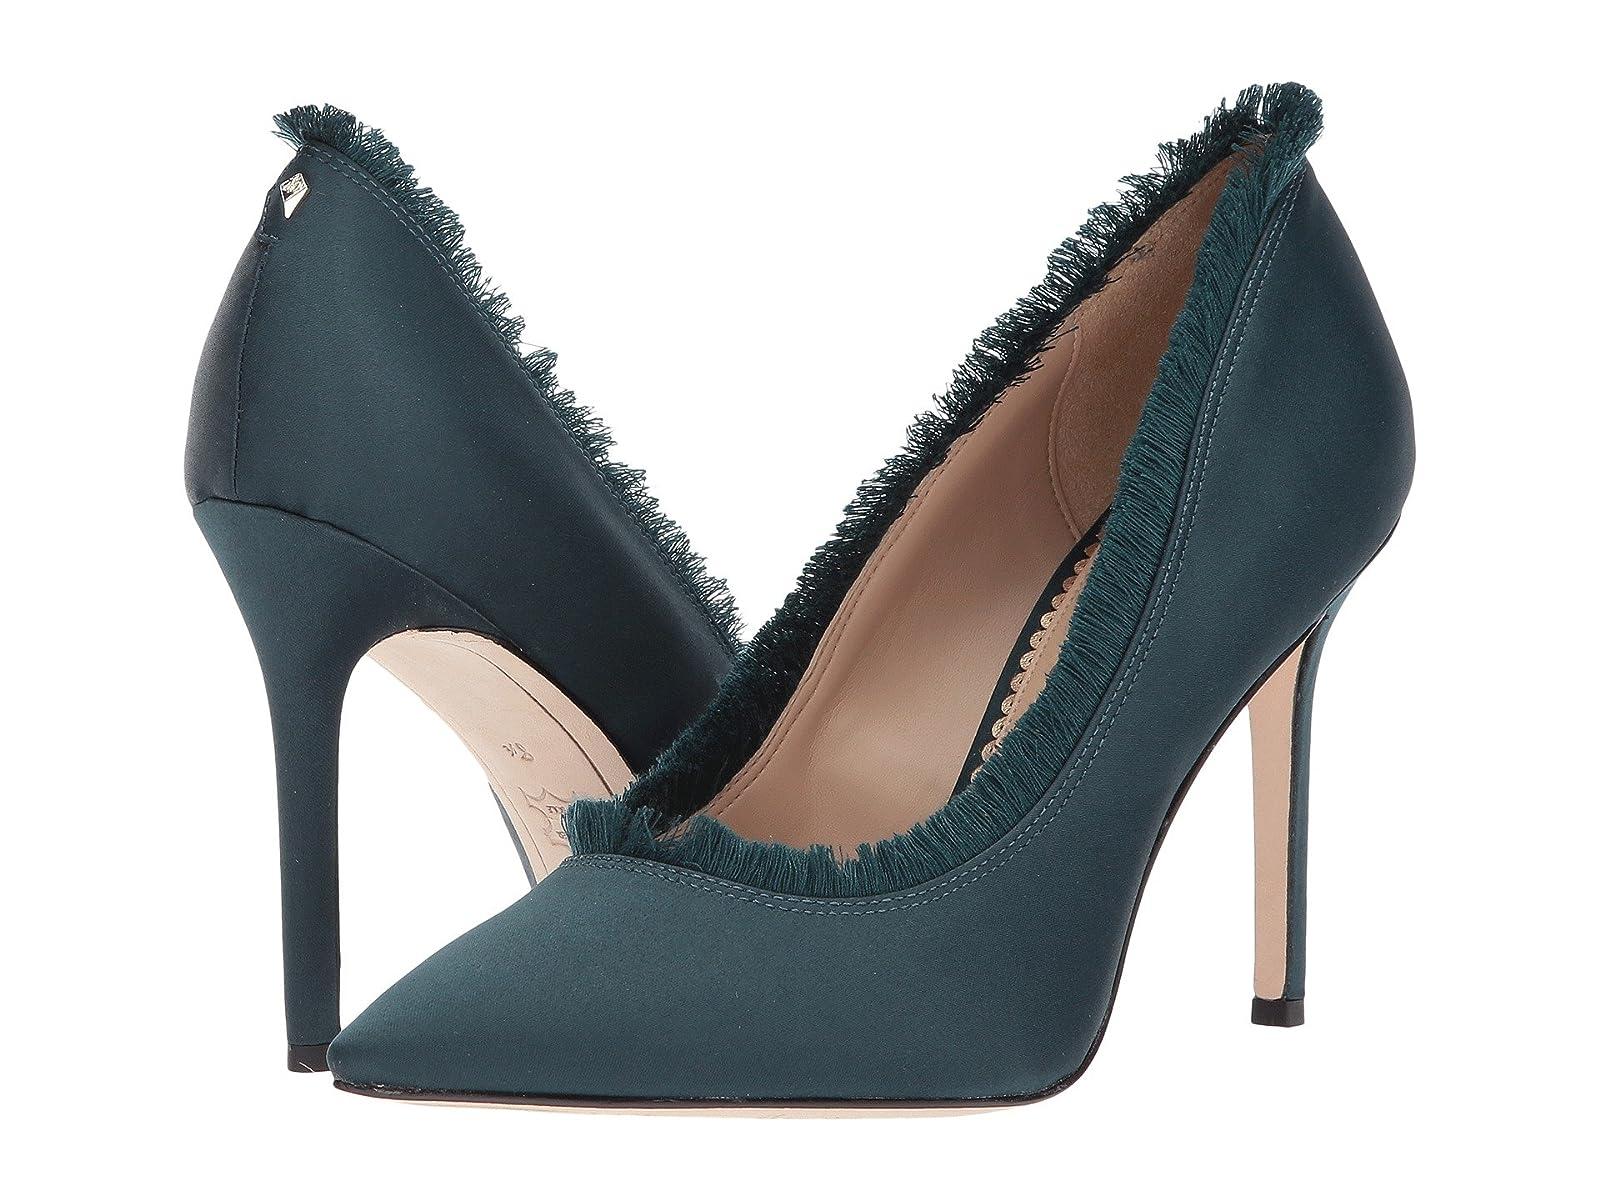 Sam Edelman HalanCheap and distinctive eye-catching shoes